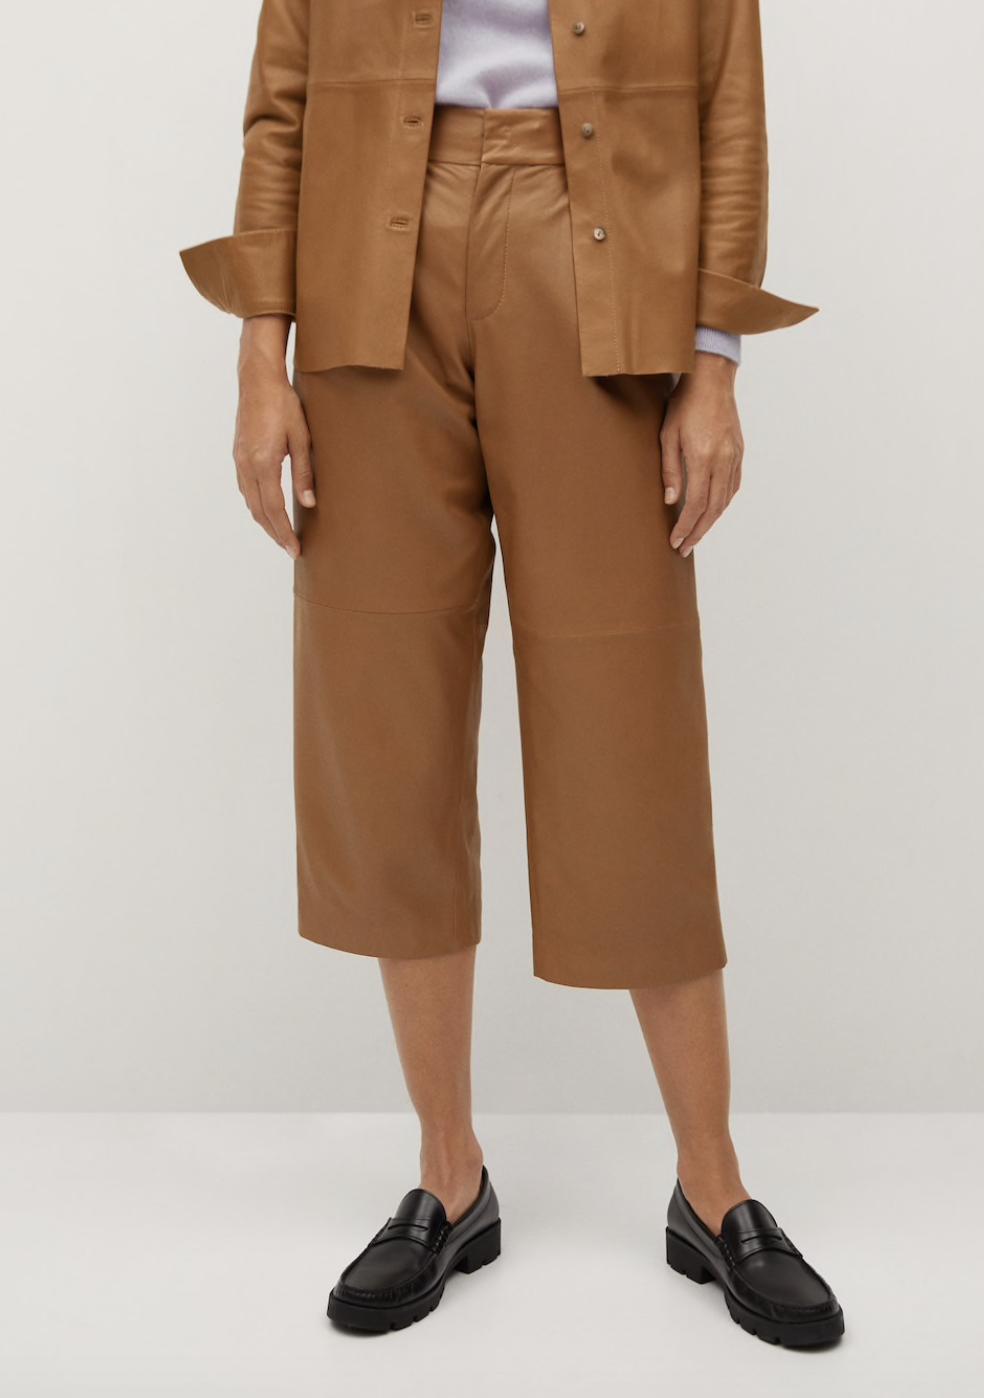 pantaloni in pelle AI 2020